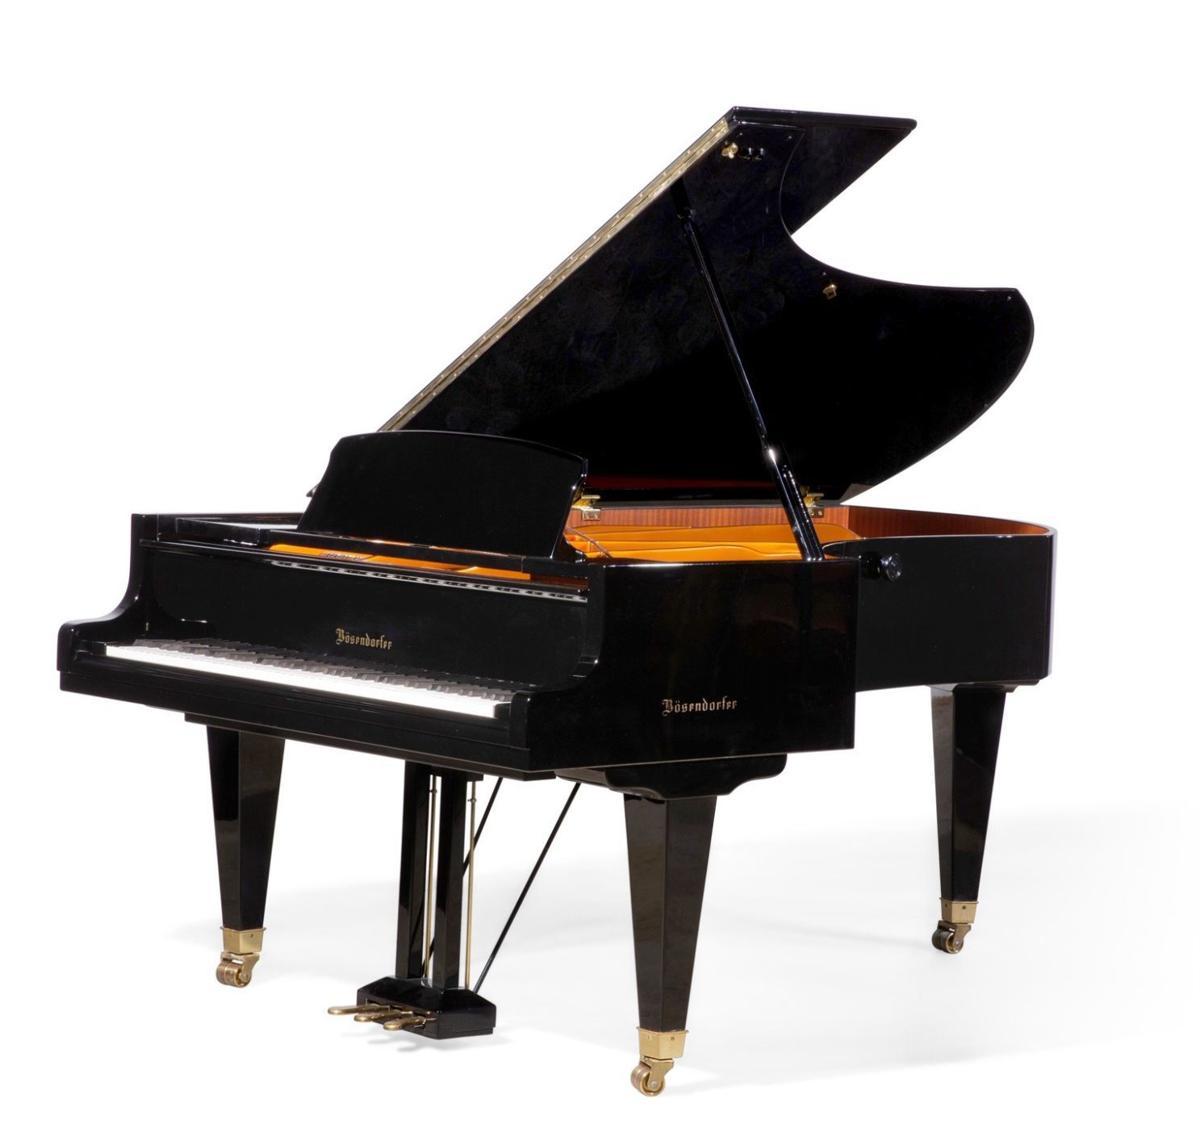 Bosendorfer piano.jpg